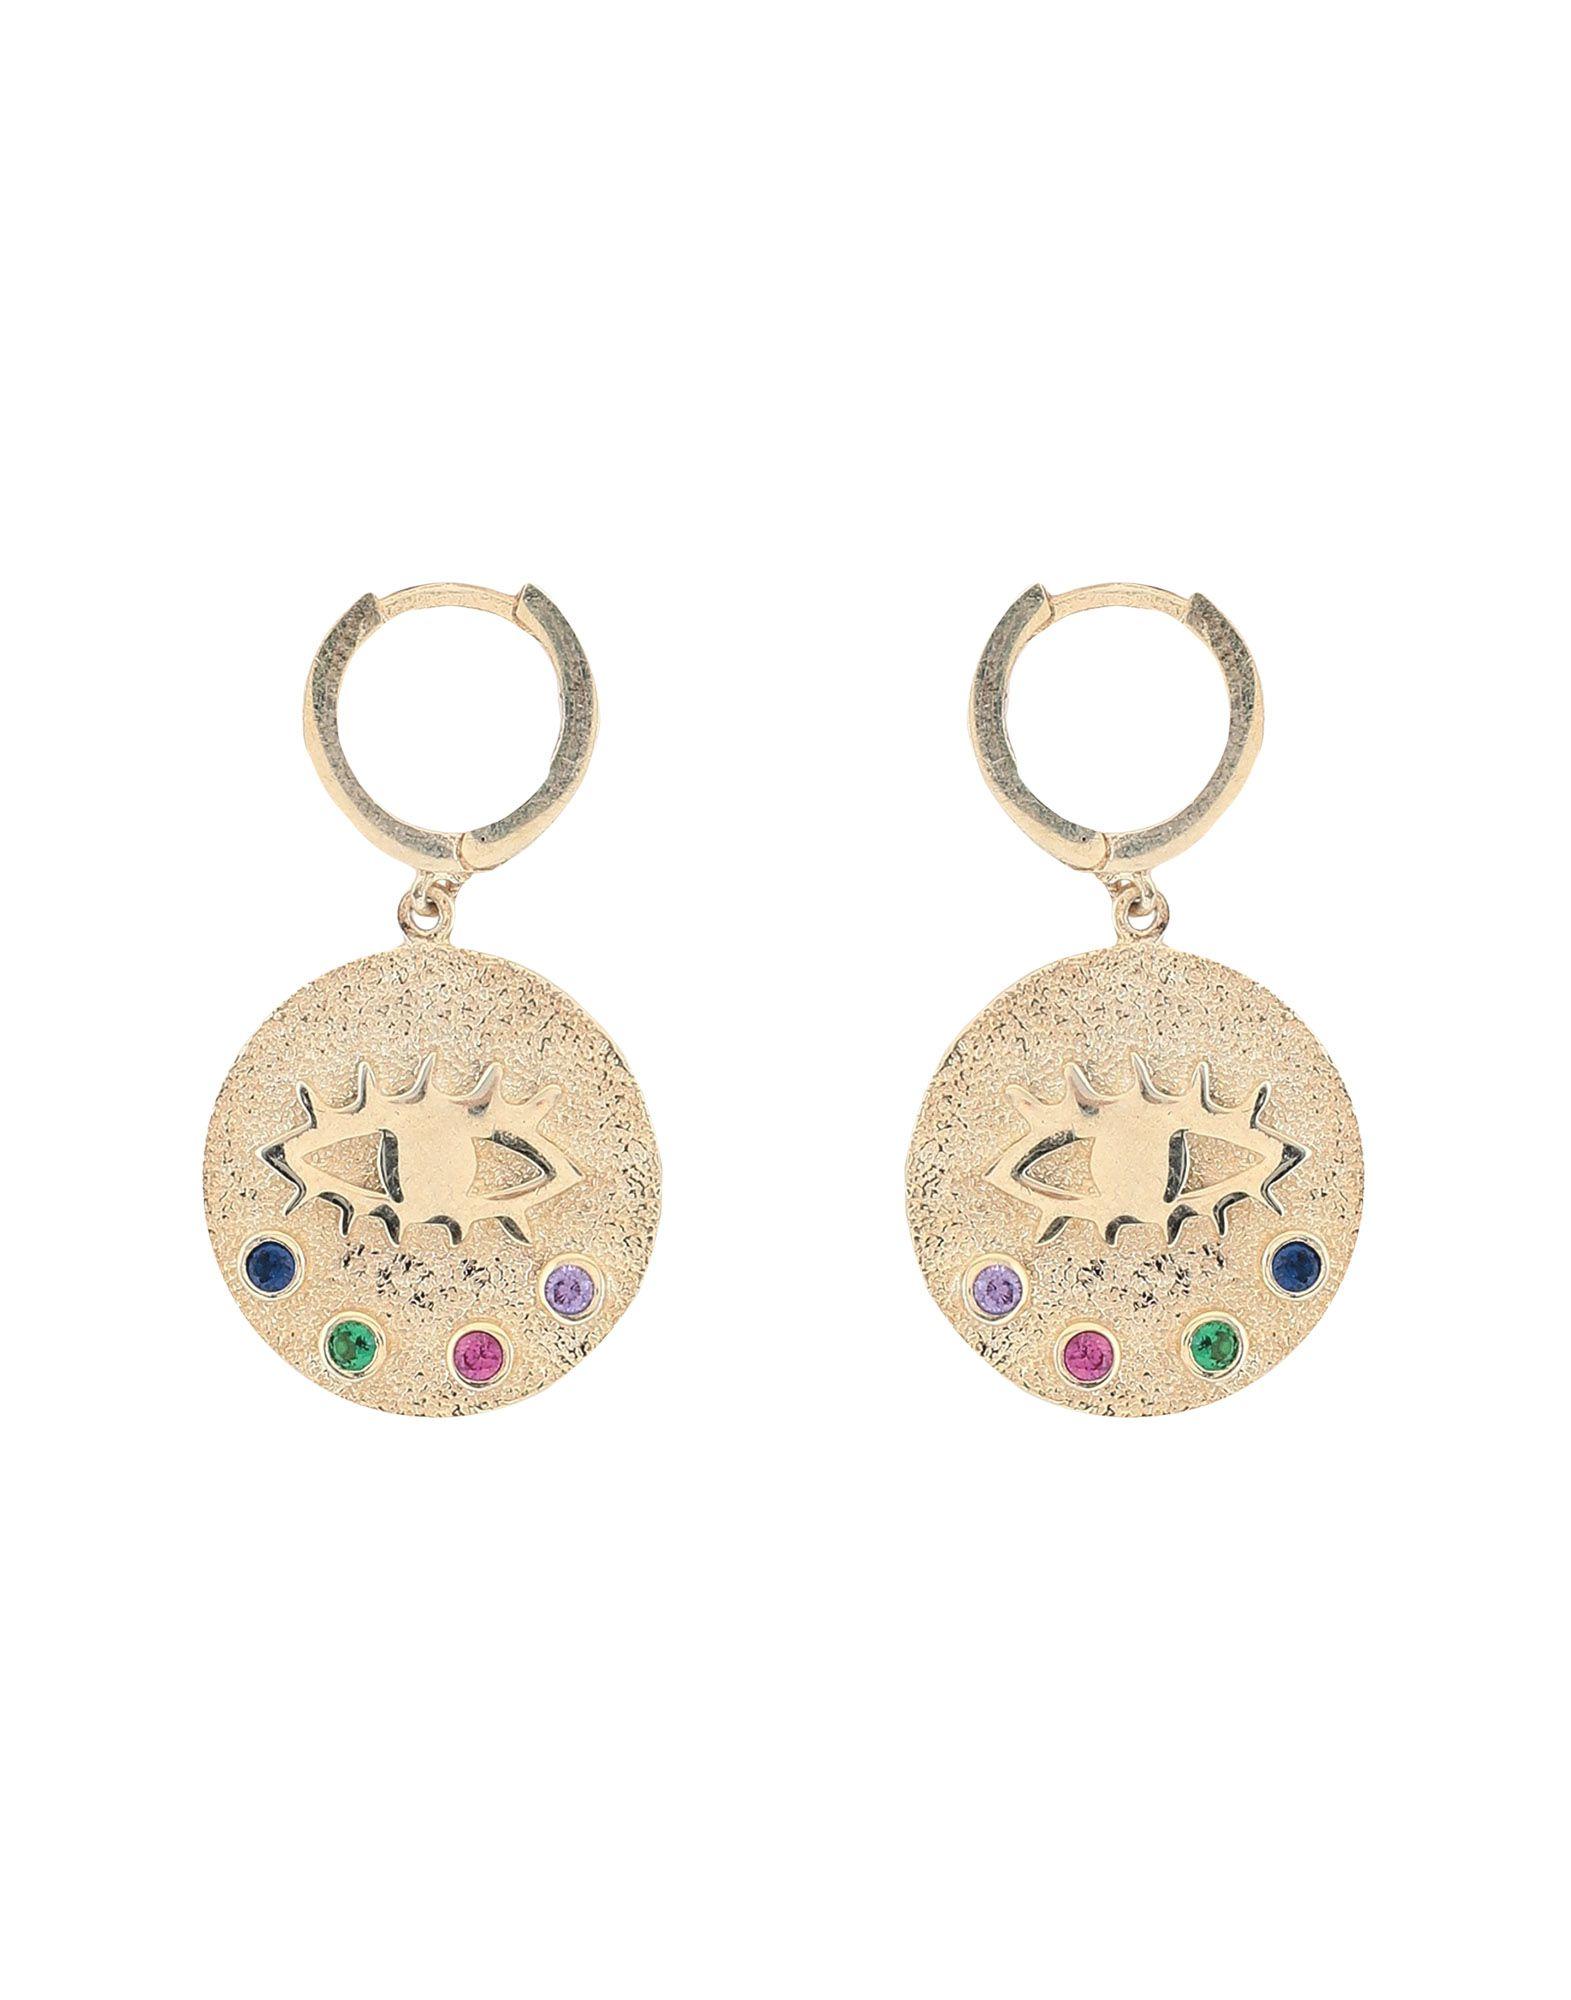 SPHERA MILANO Earrings. rhinestones, framed closure. 925/1000 silver, 18kt Gold-plated